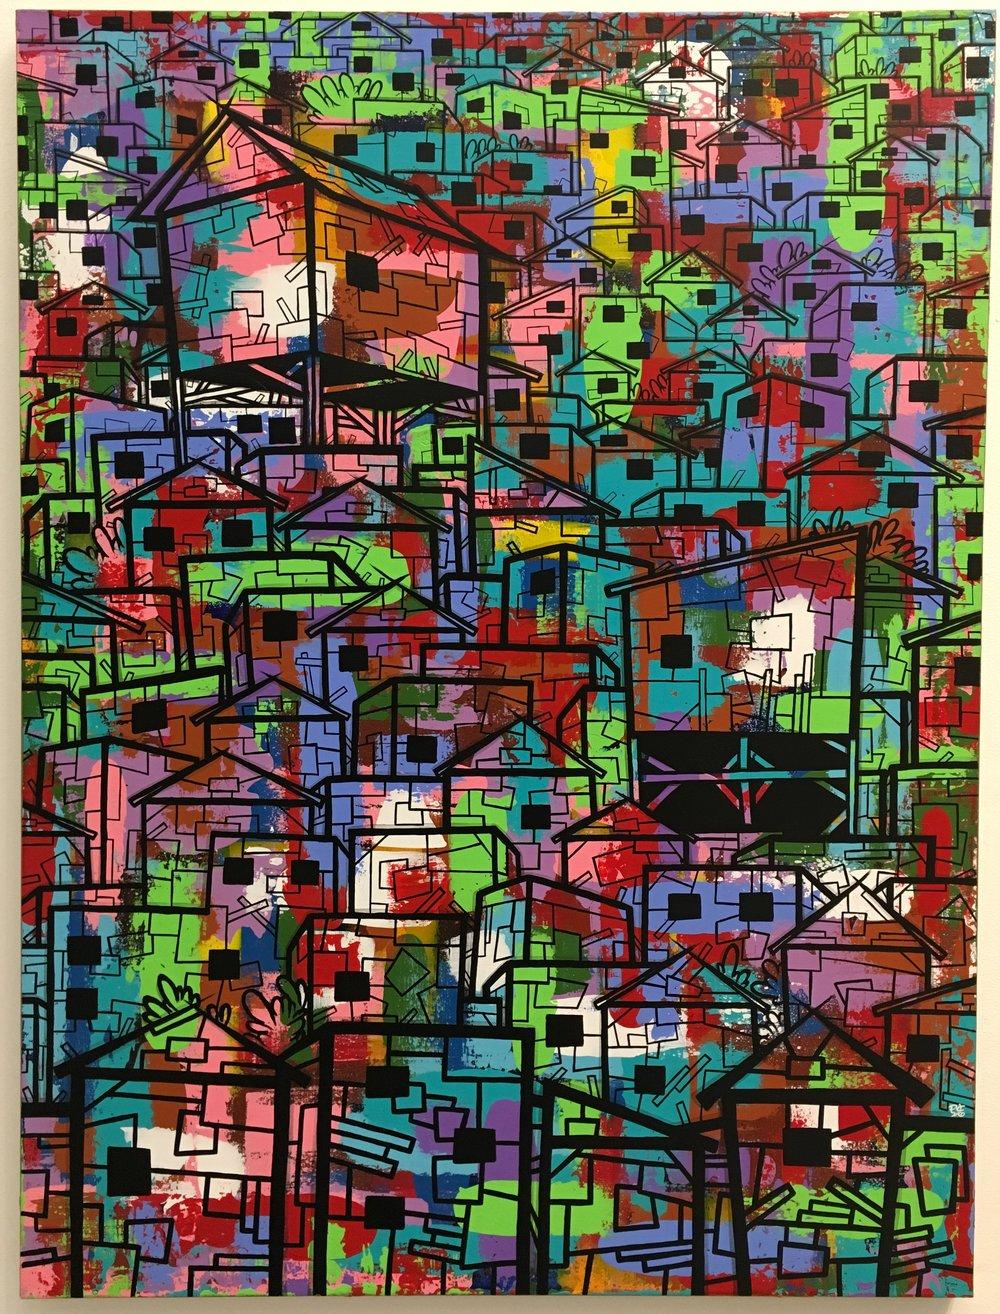 sLum 4#Acrylic & ink on canvas#48 x 36 inches#$3900